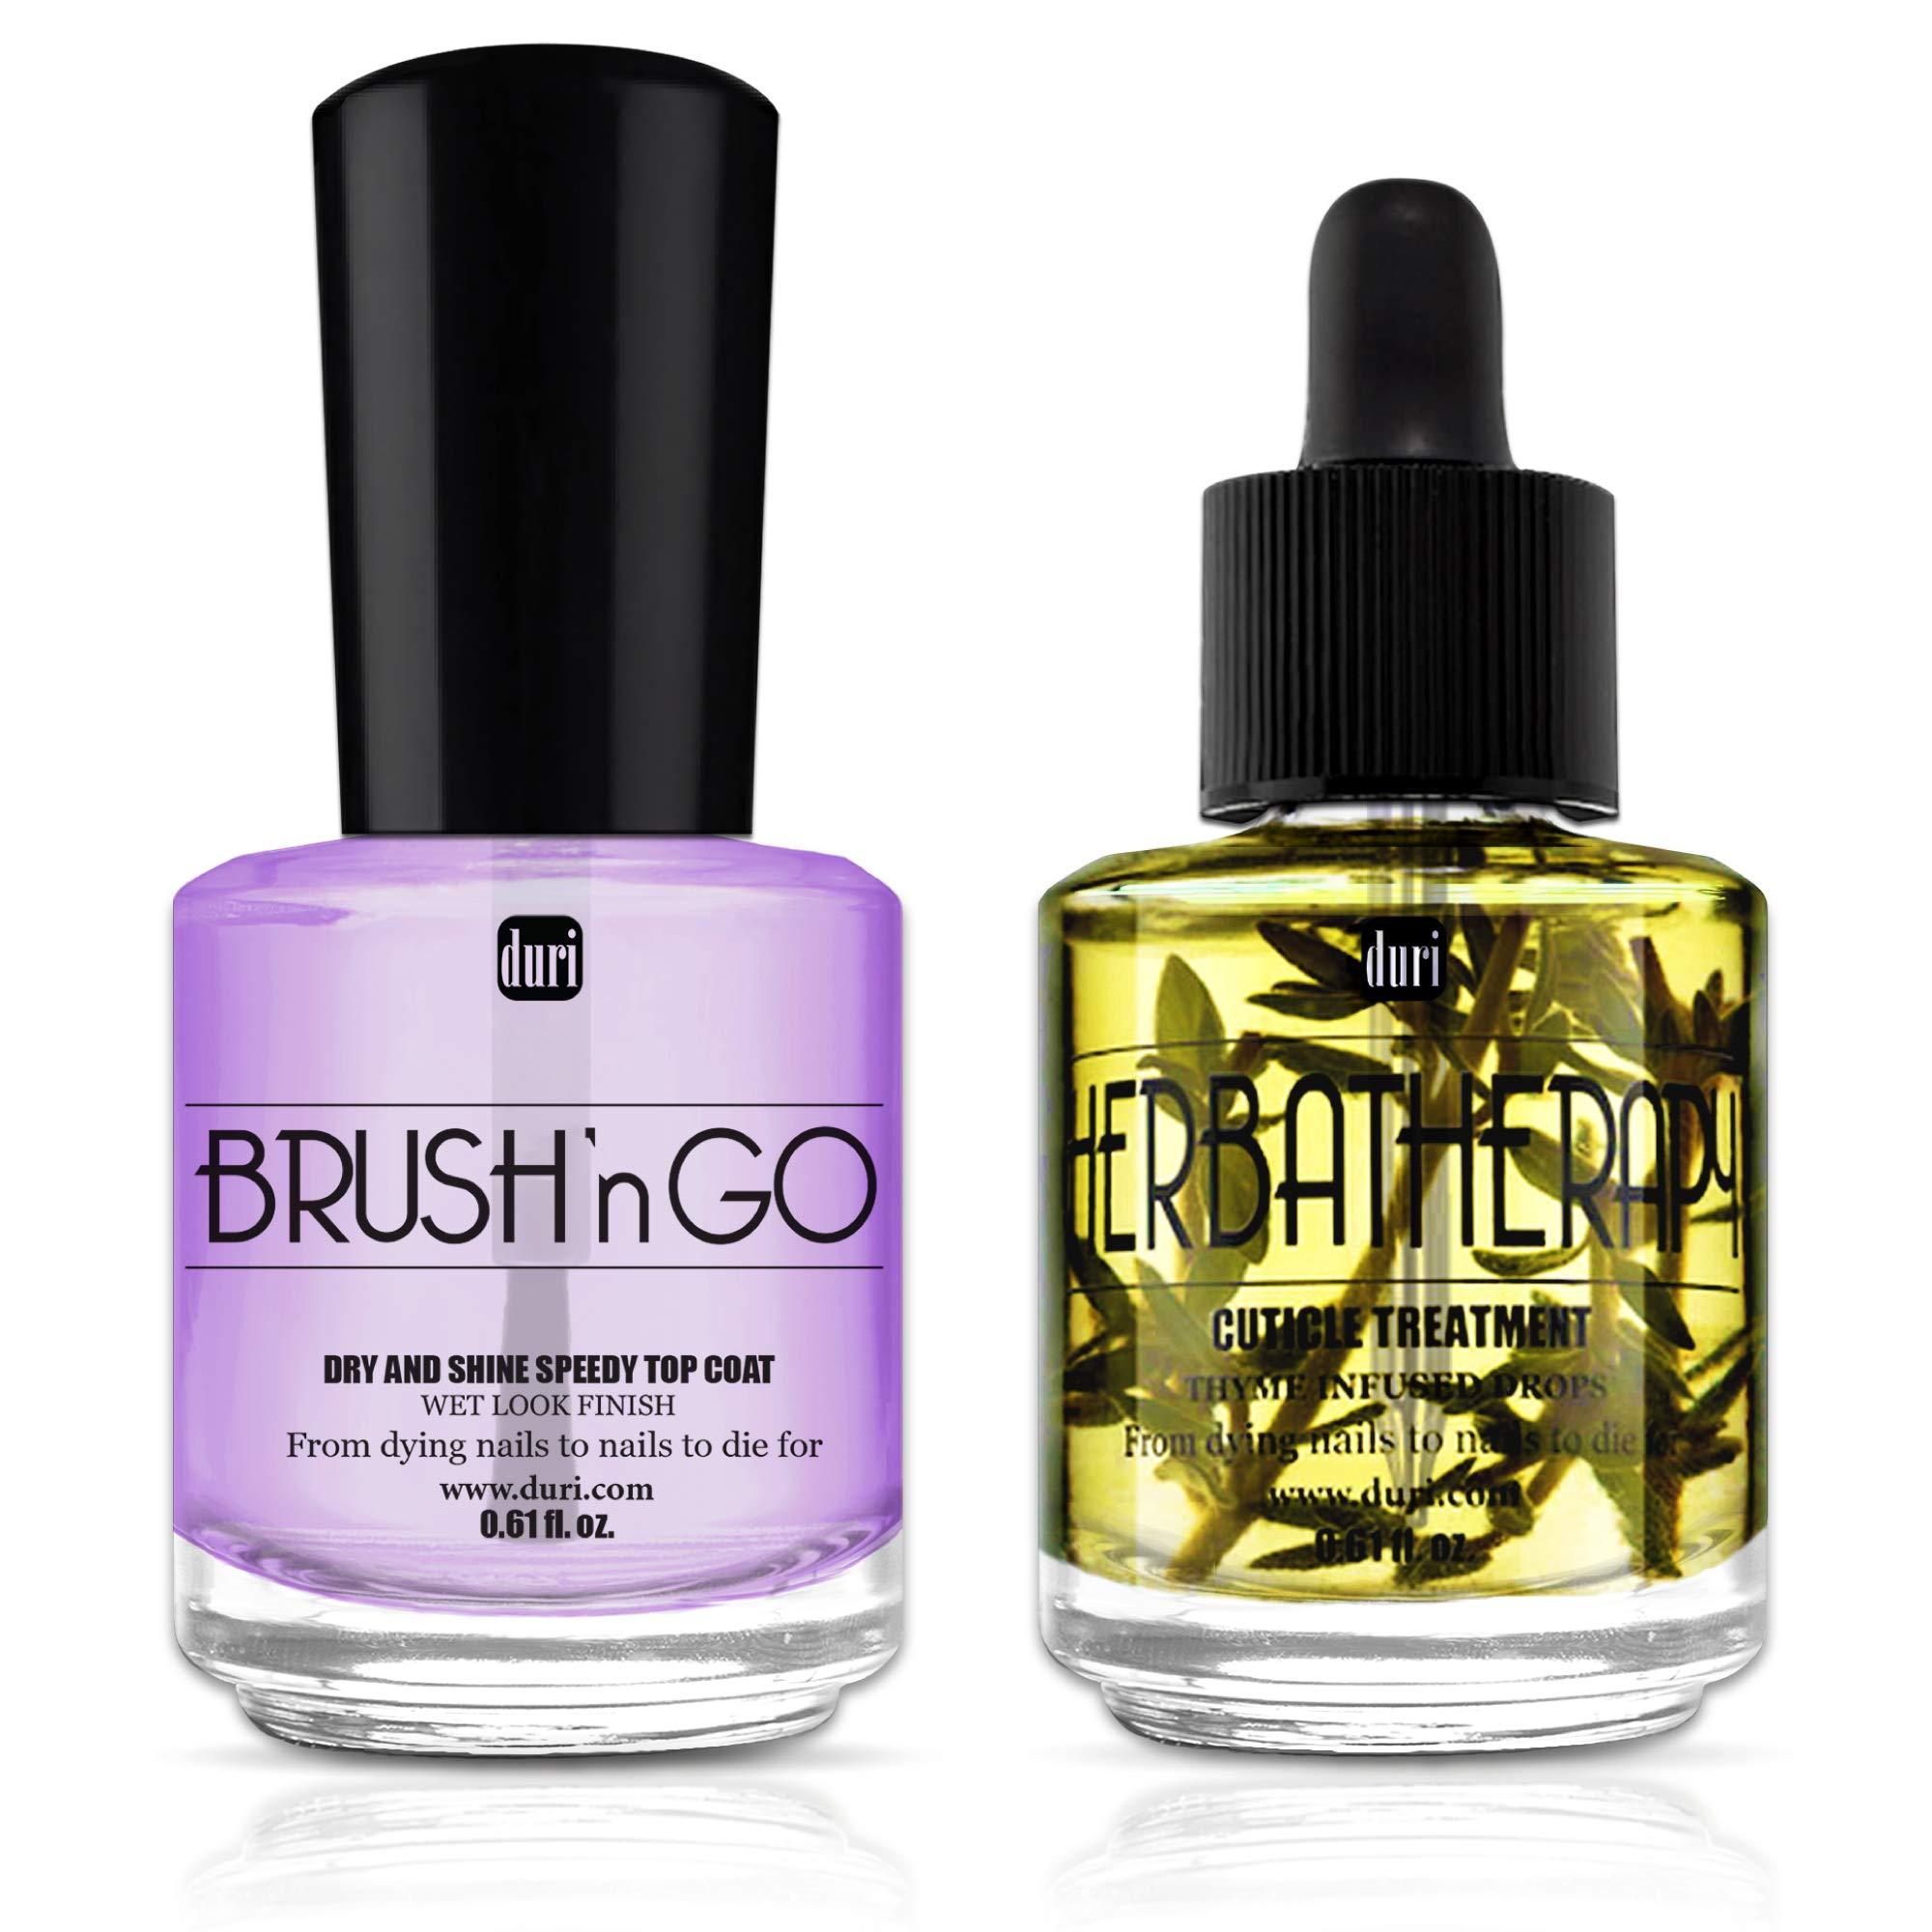 duri Top Coat and Cuticle Treatment Combo, Brush'n GO Dry & Shine Speedy Top Coat 0.61 fl.oz, Herbatherapy Thyme Infused Cuticle Treatment Drops 0.61 fl.oz. by duri